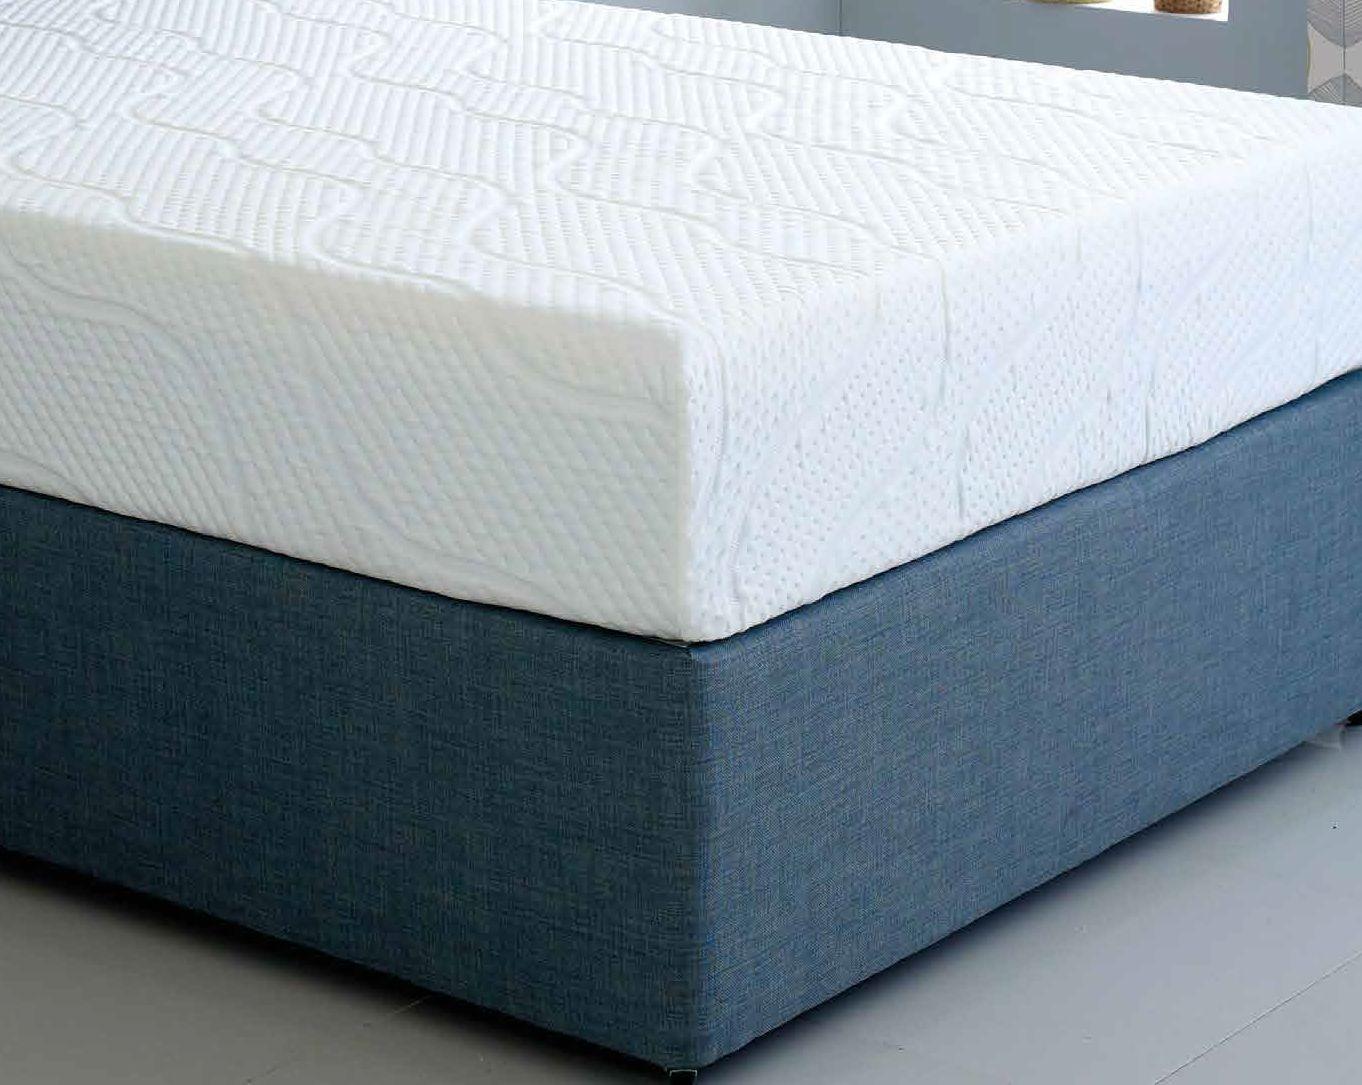 hybrid cool blue 17 5cm reflex memory foam mattress foam mattress